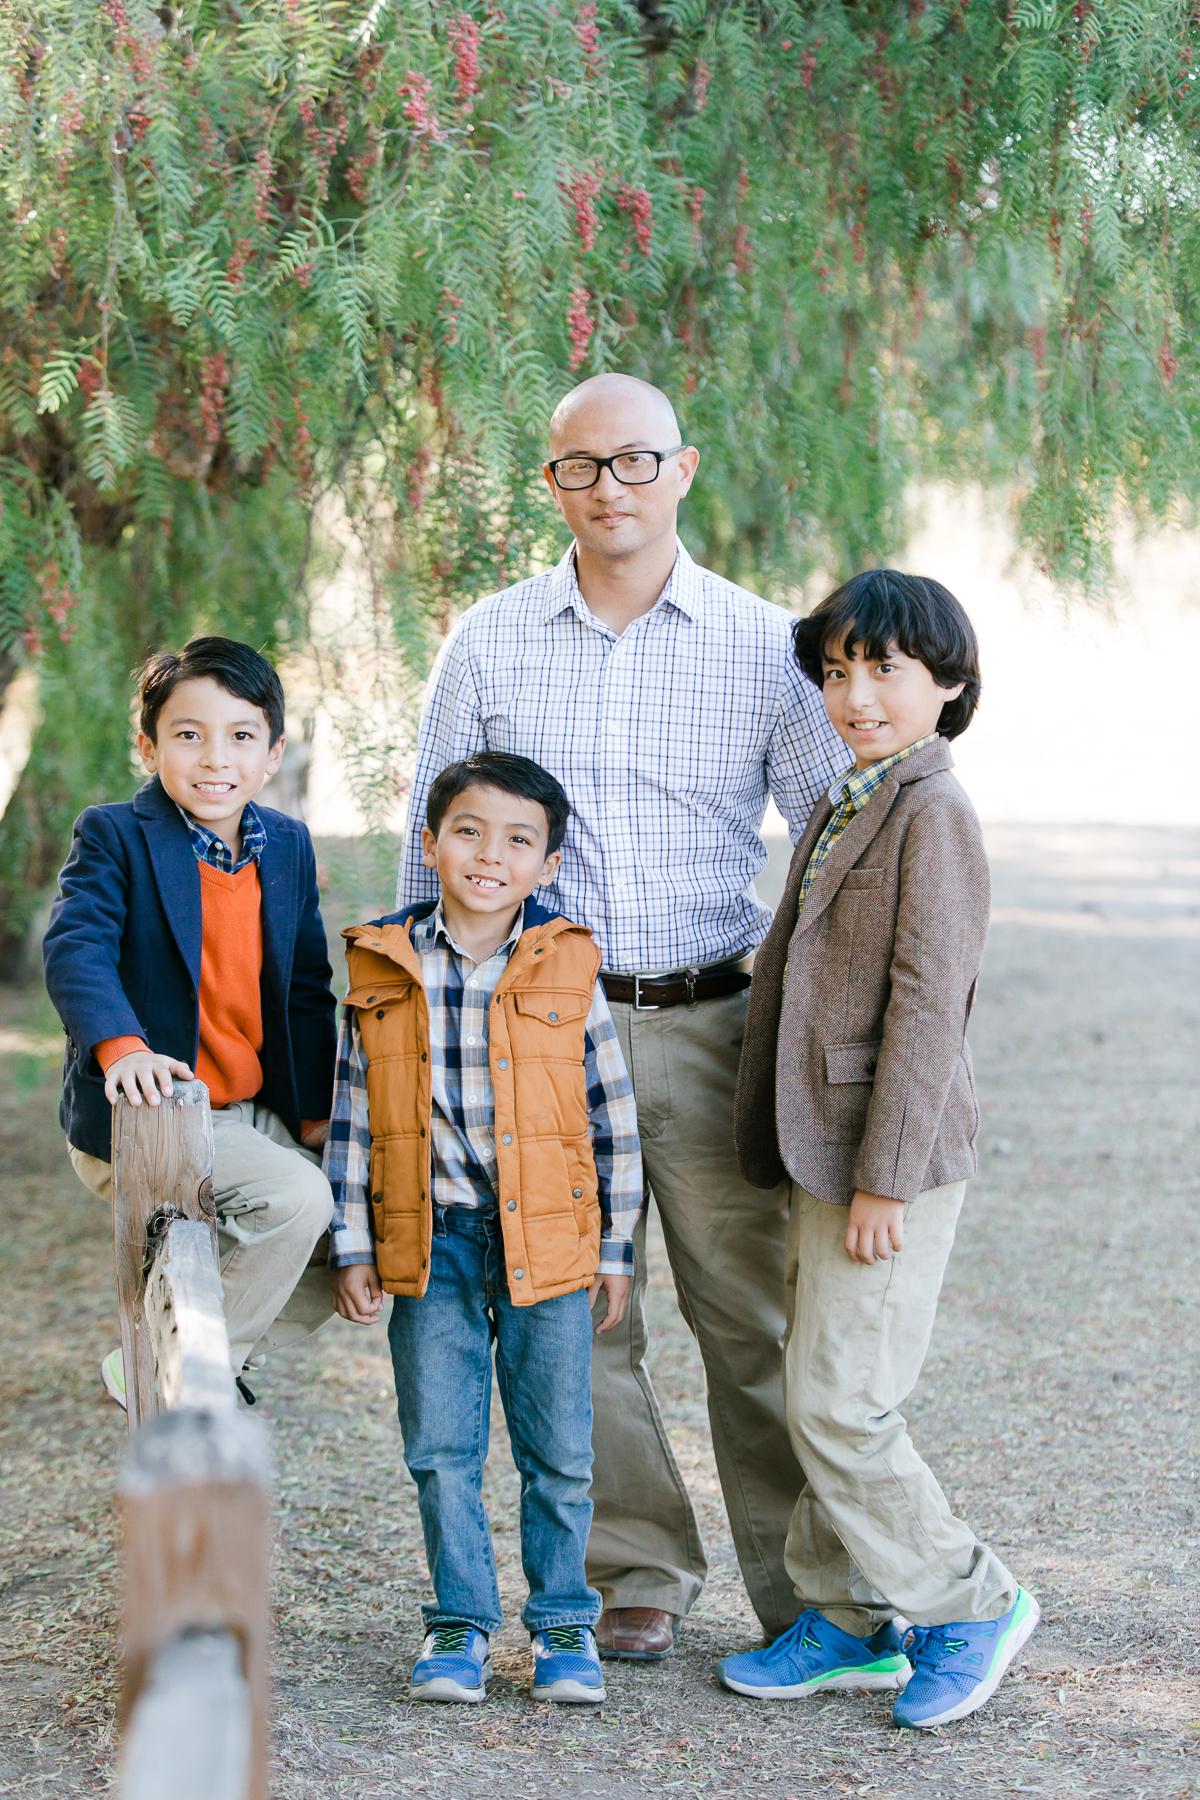 NEMA Photo I.Knightly069 - The Almodovar Family | Los Penasquitos canyon preserve | San Diego Photographer